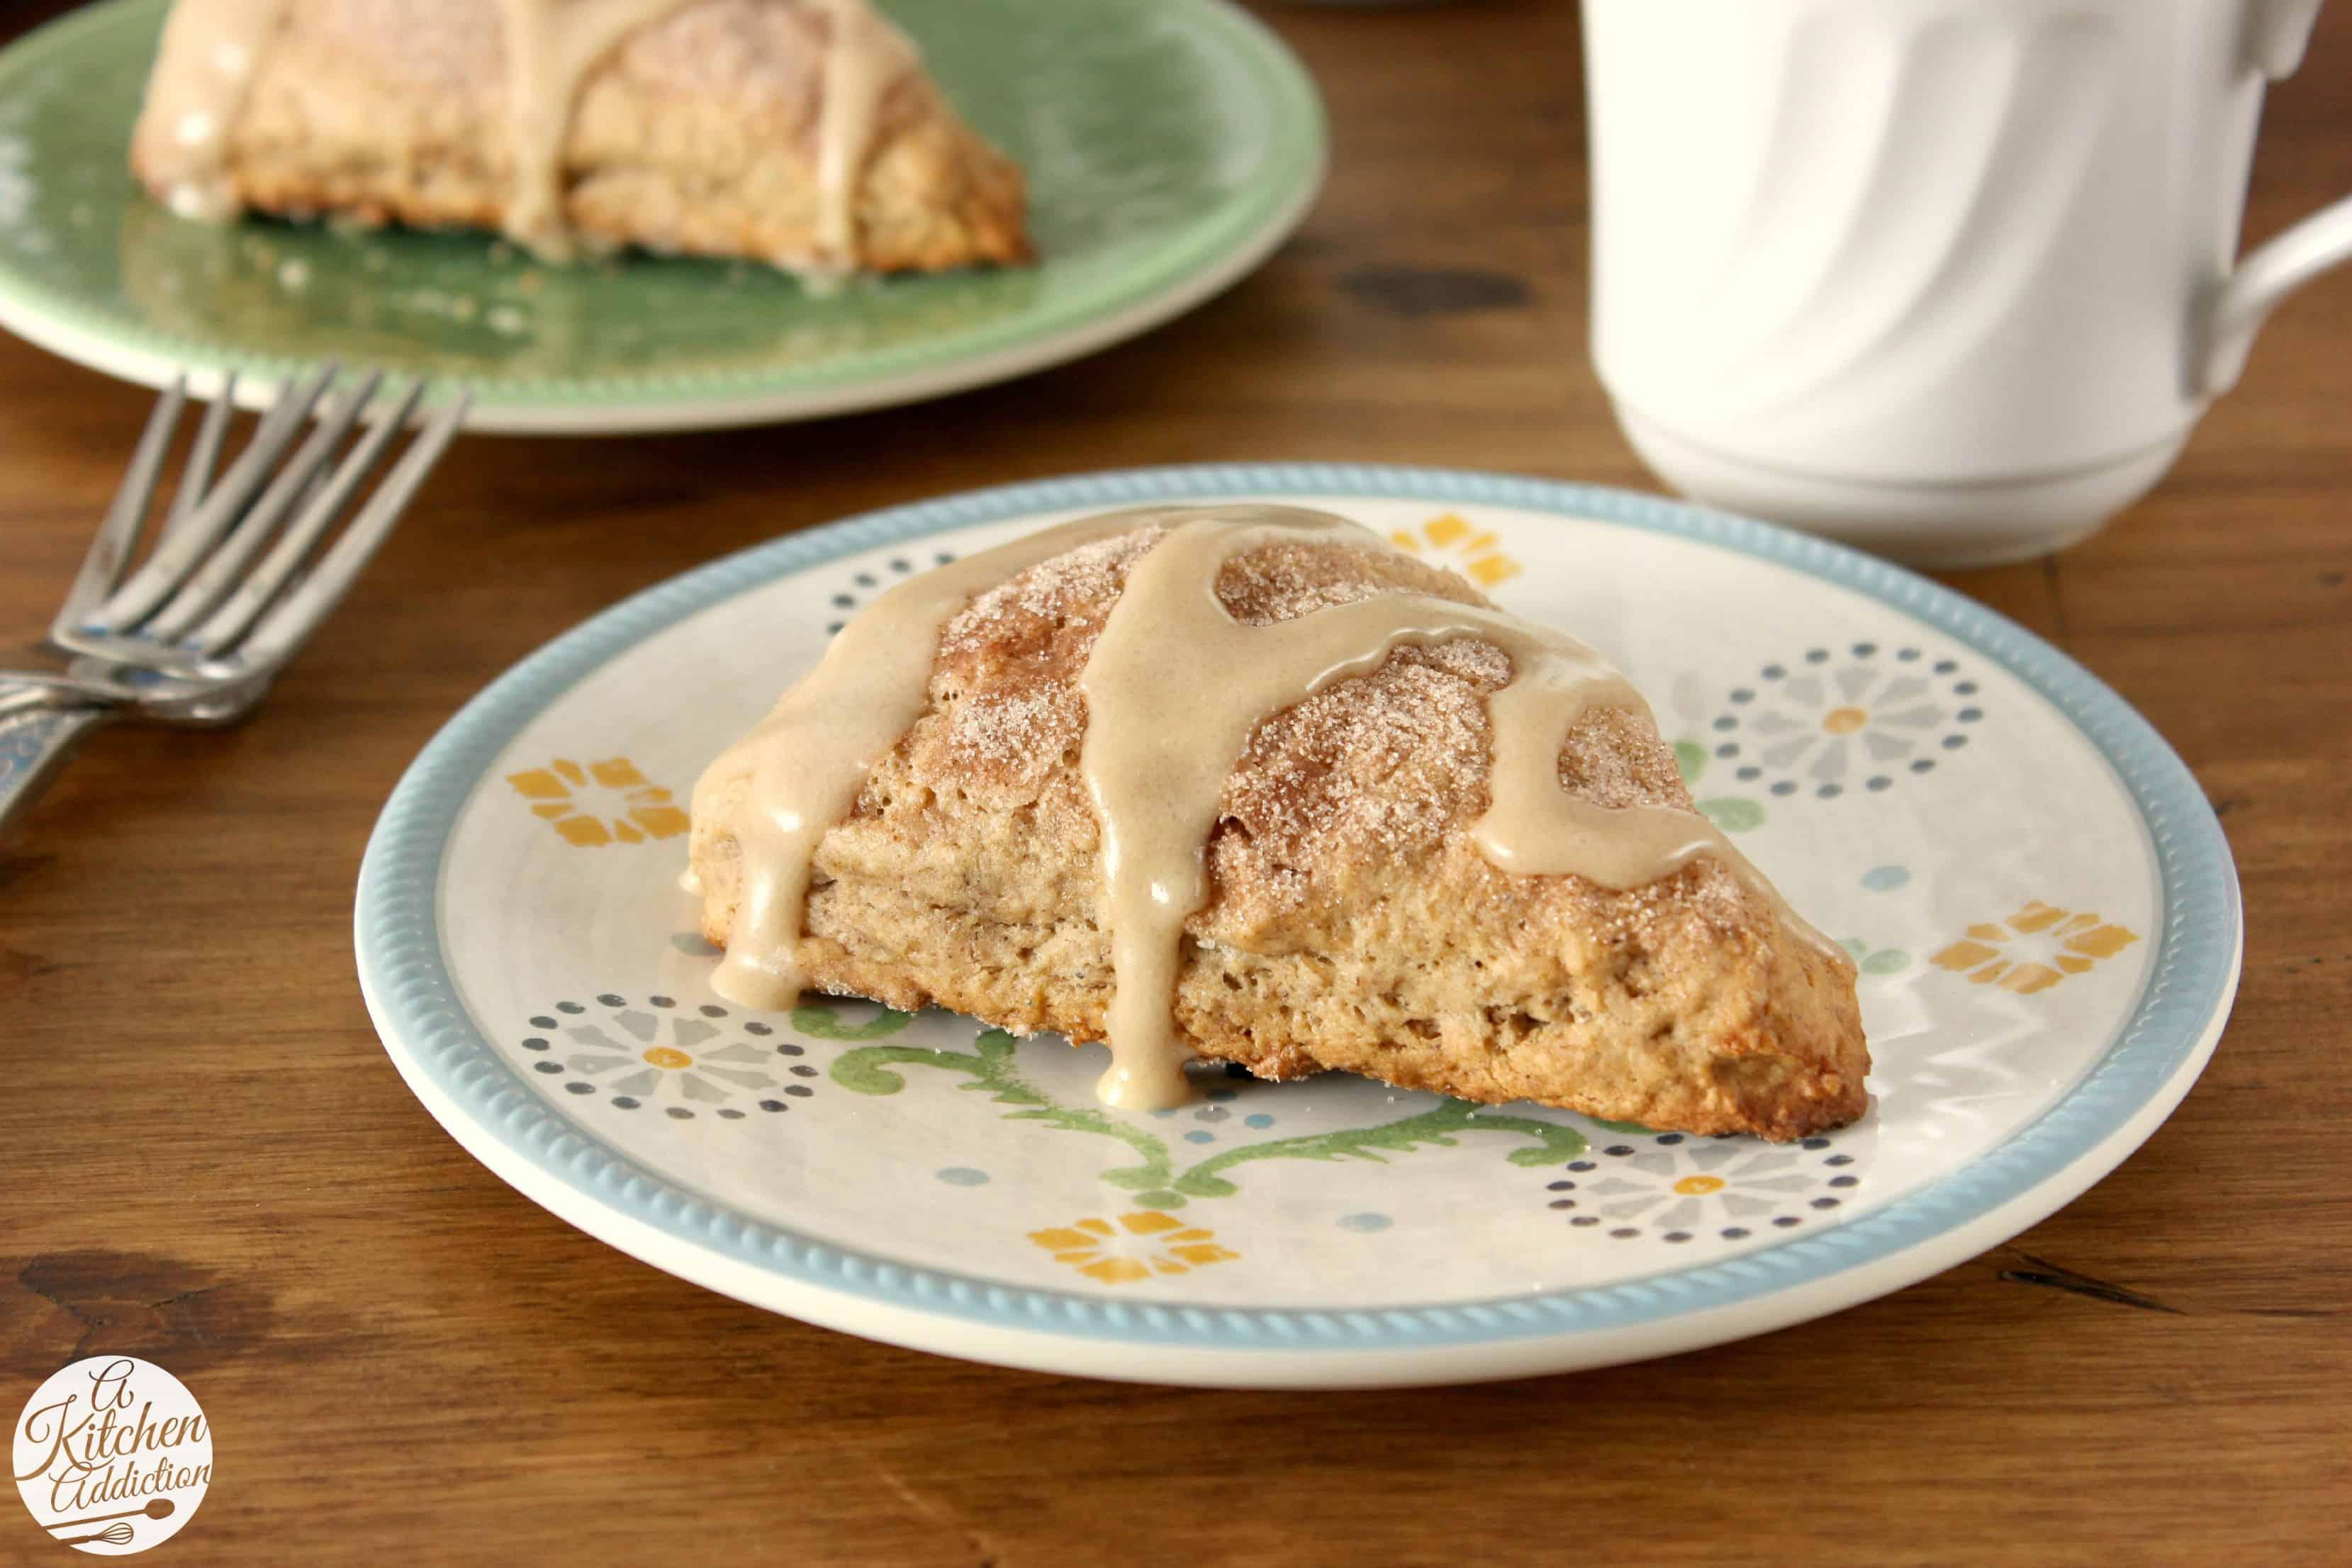 Banana bread scones a kitchen addiction for A kitchen addiction